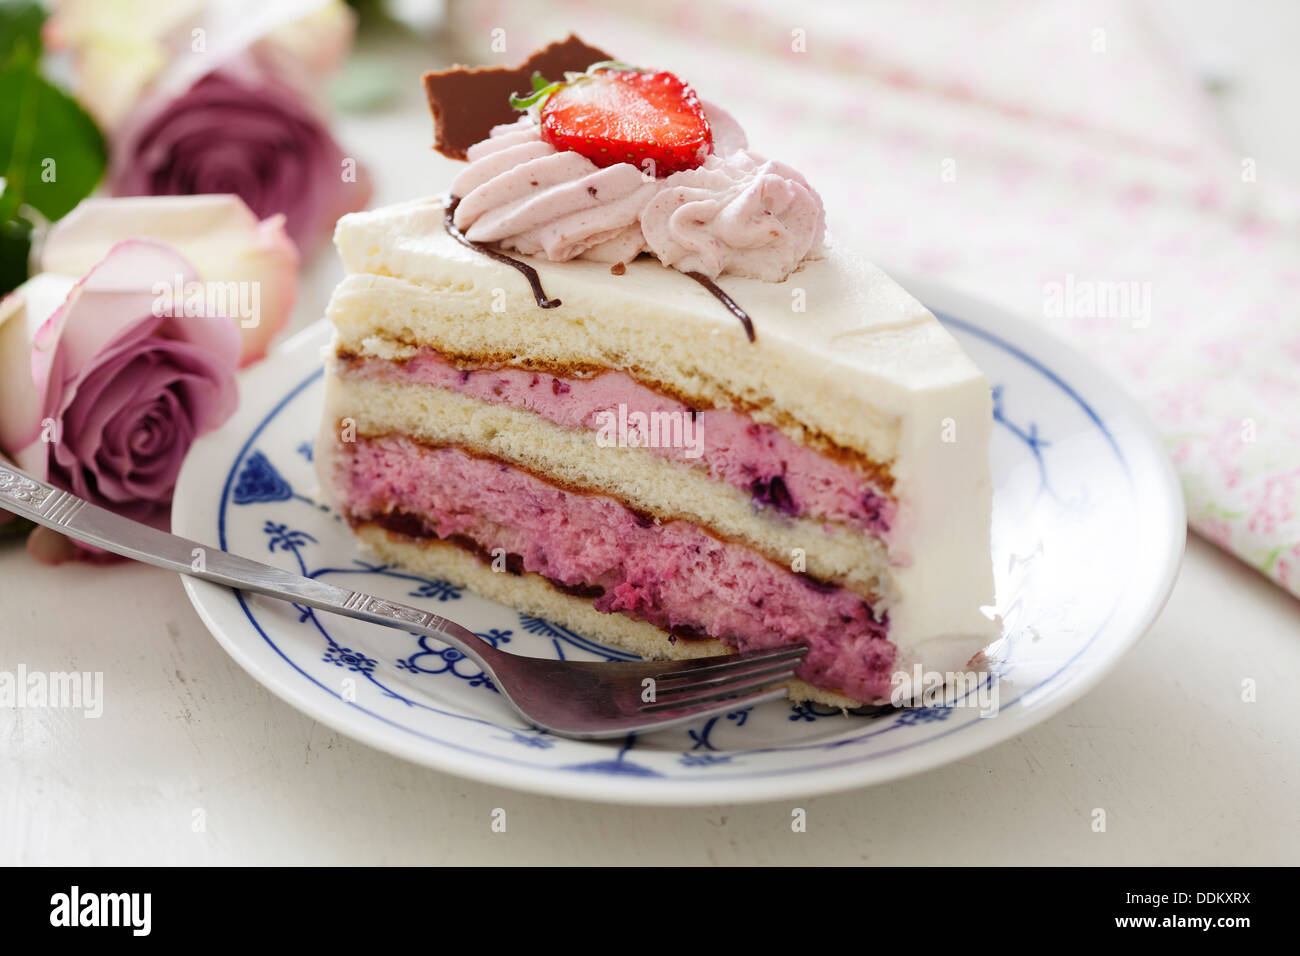 Las tortas de fresa Imagen De Stock